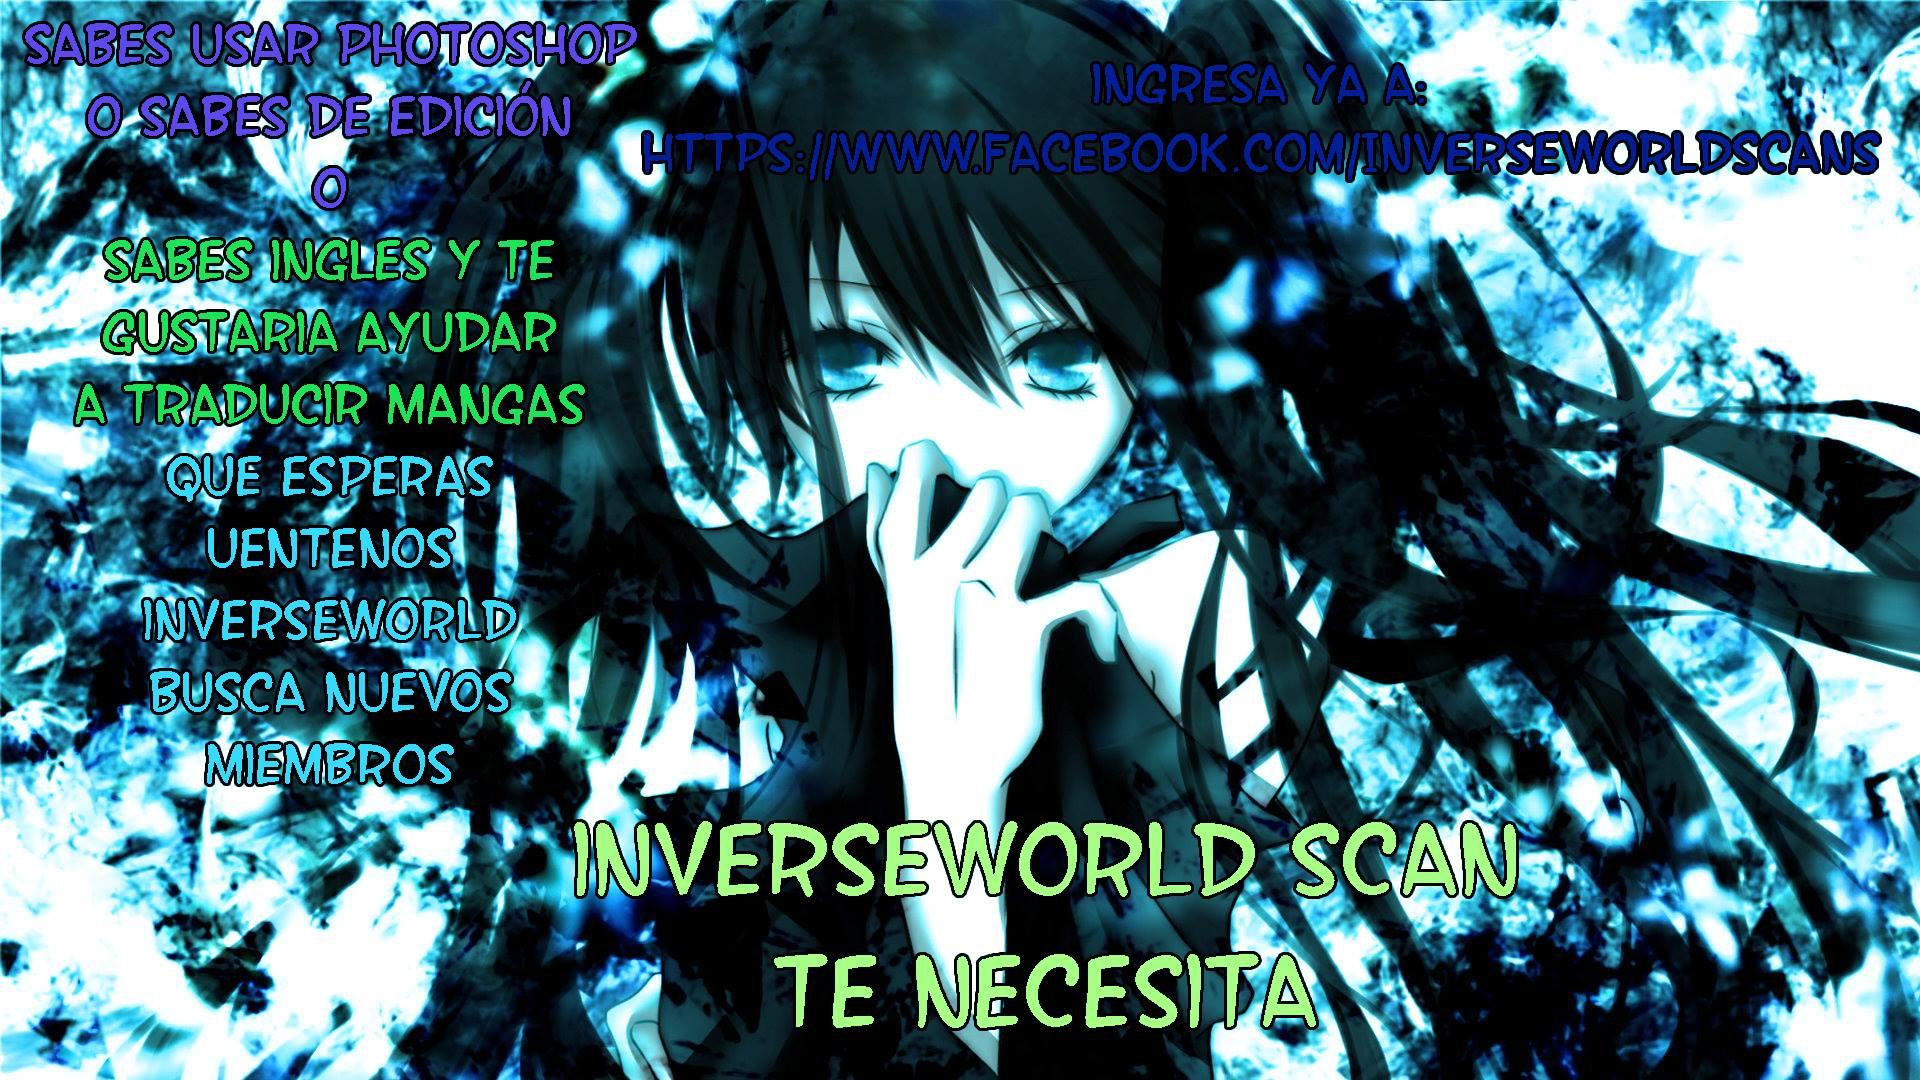 http://c5.ninemanga.com/es_manga/18/16210/415317/55860148c155d60c6eec28c6ecbad099.jpg Page 2